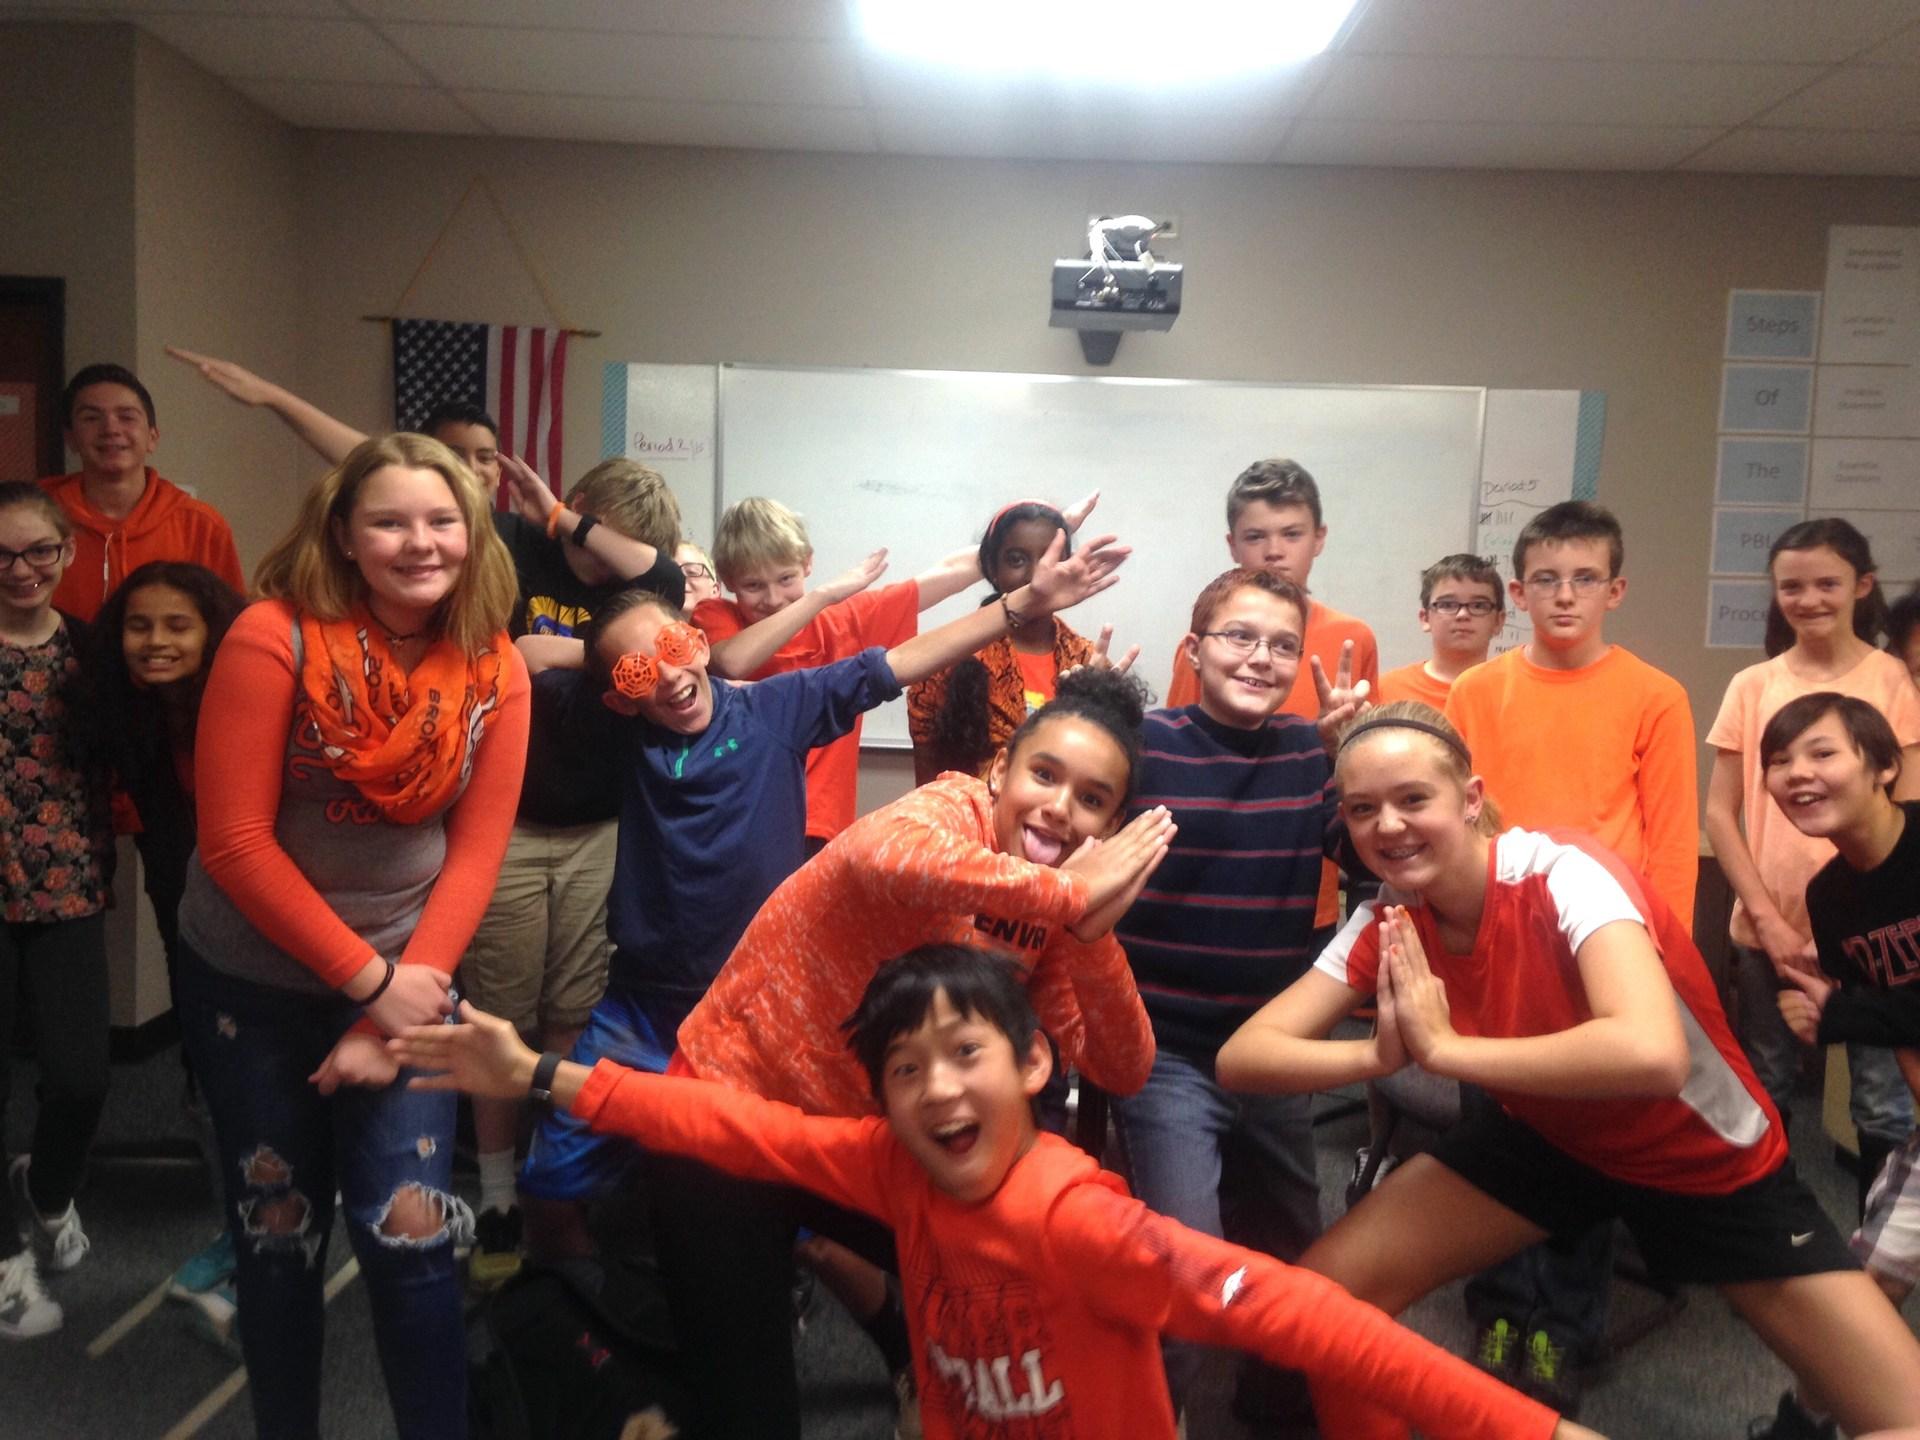 middle school students wearing orange